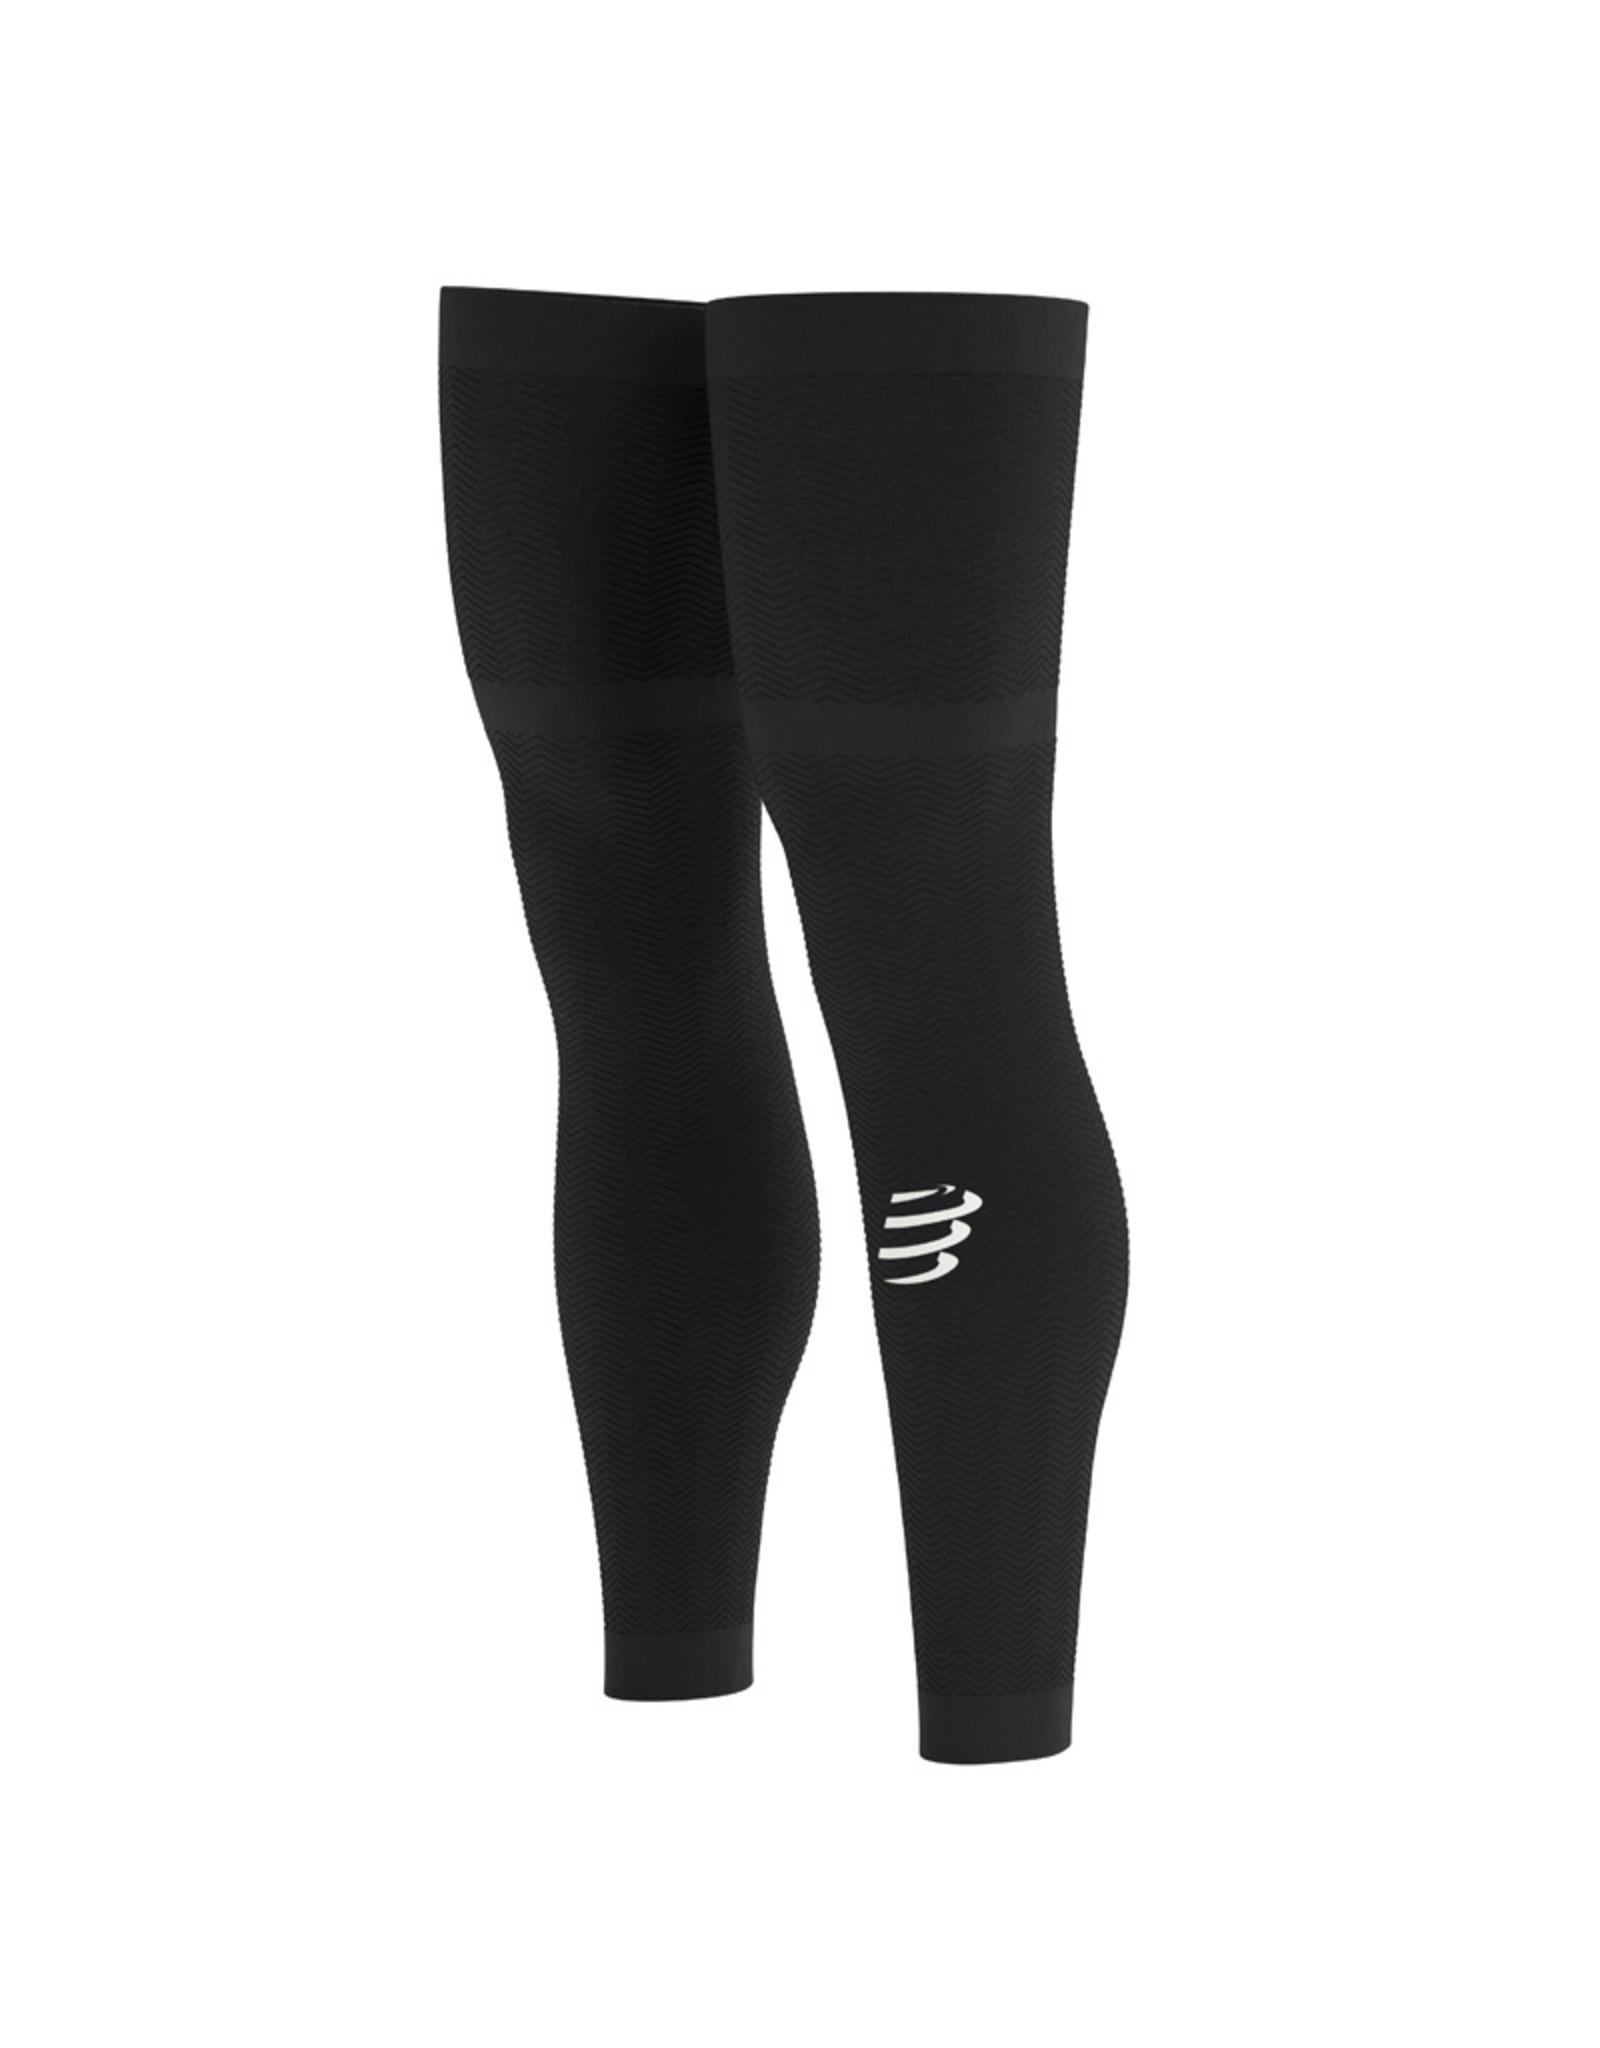 Compressport Full Legs